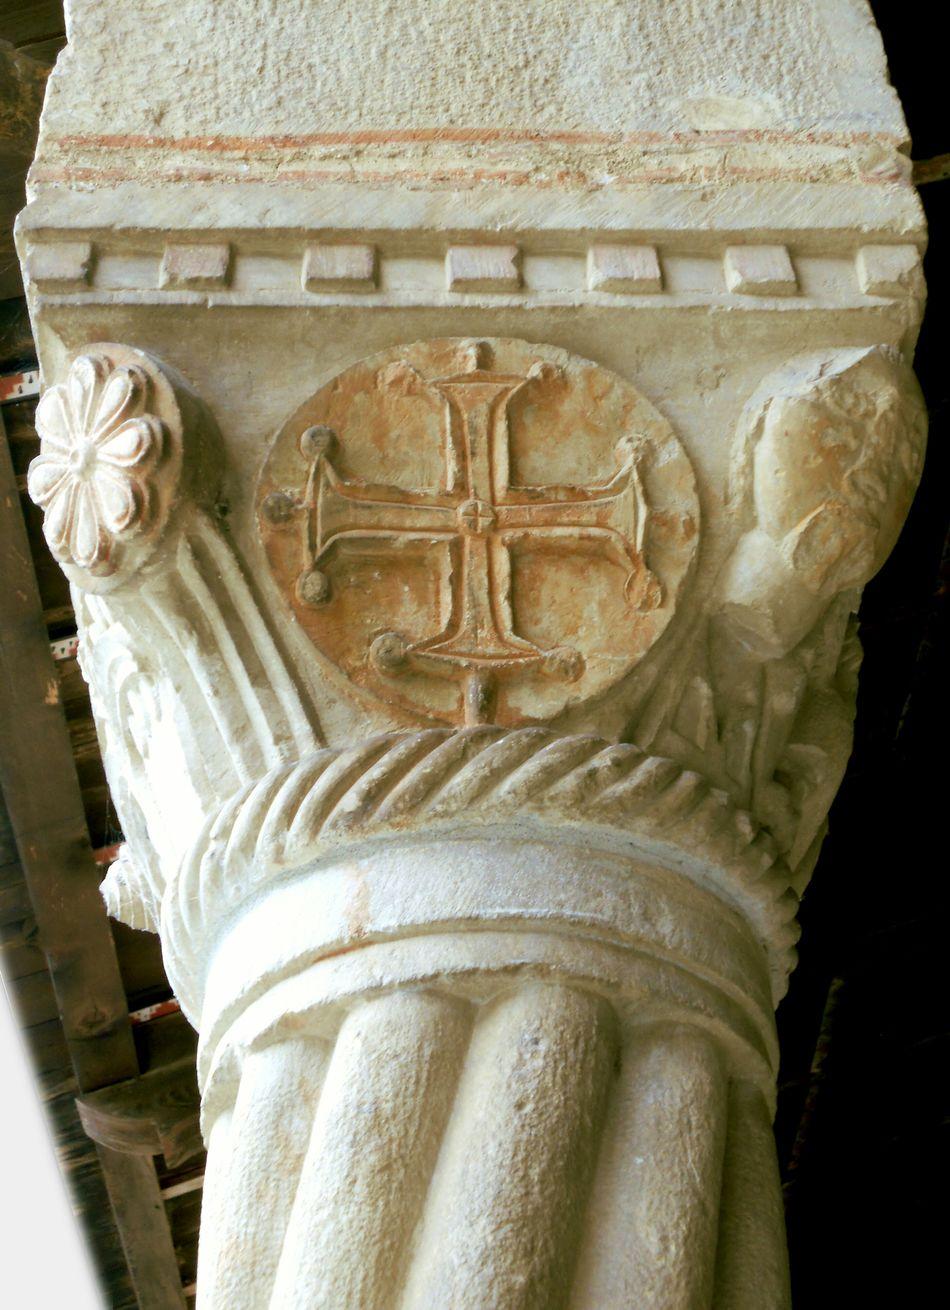 Medieval Capital Stone Greek Symbols Cross Romanesque Religious  Church Basilique Column Capitals